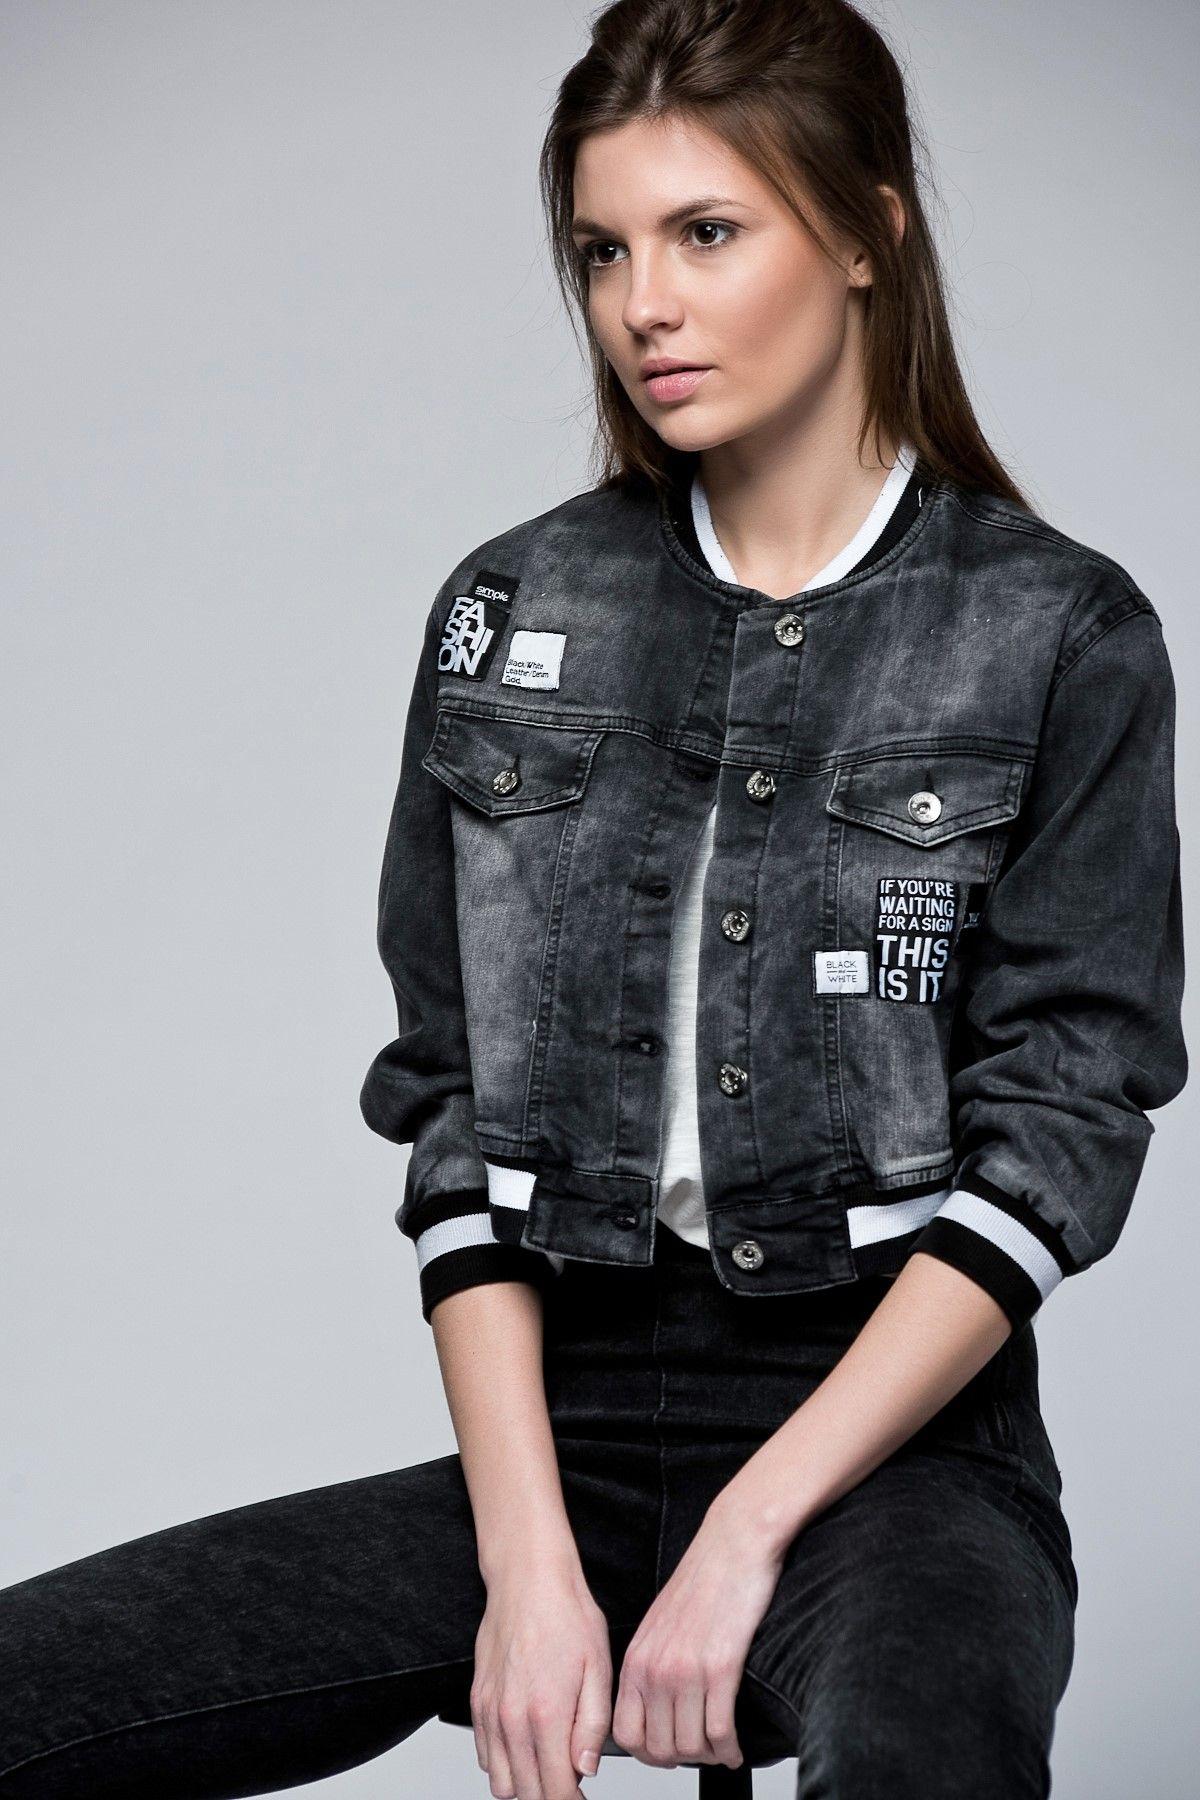 Fume Kot Ceket 10089 Kot Ceket Trend Elbiseler Jean Ceket